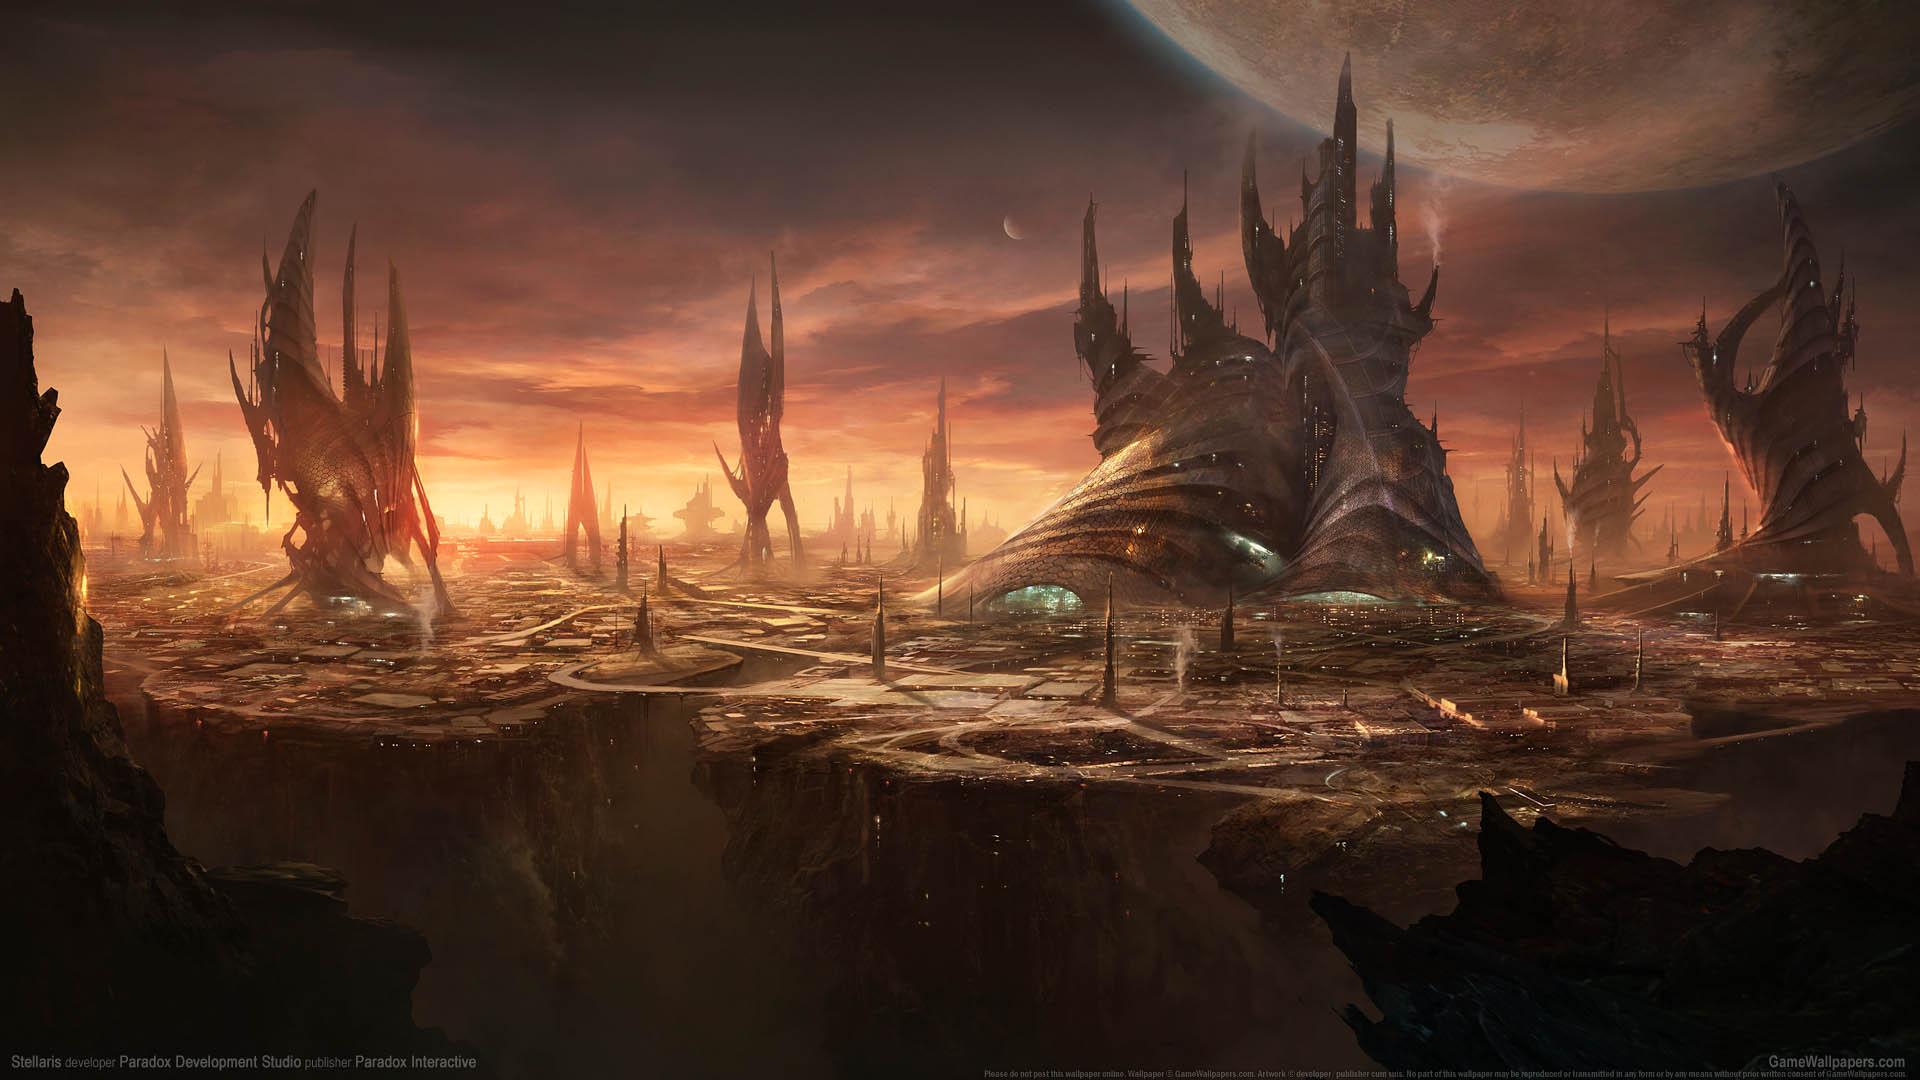 aliens wallpaper ipad